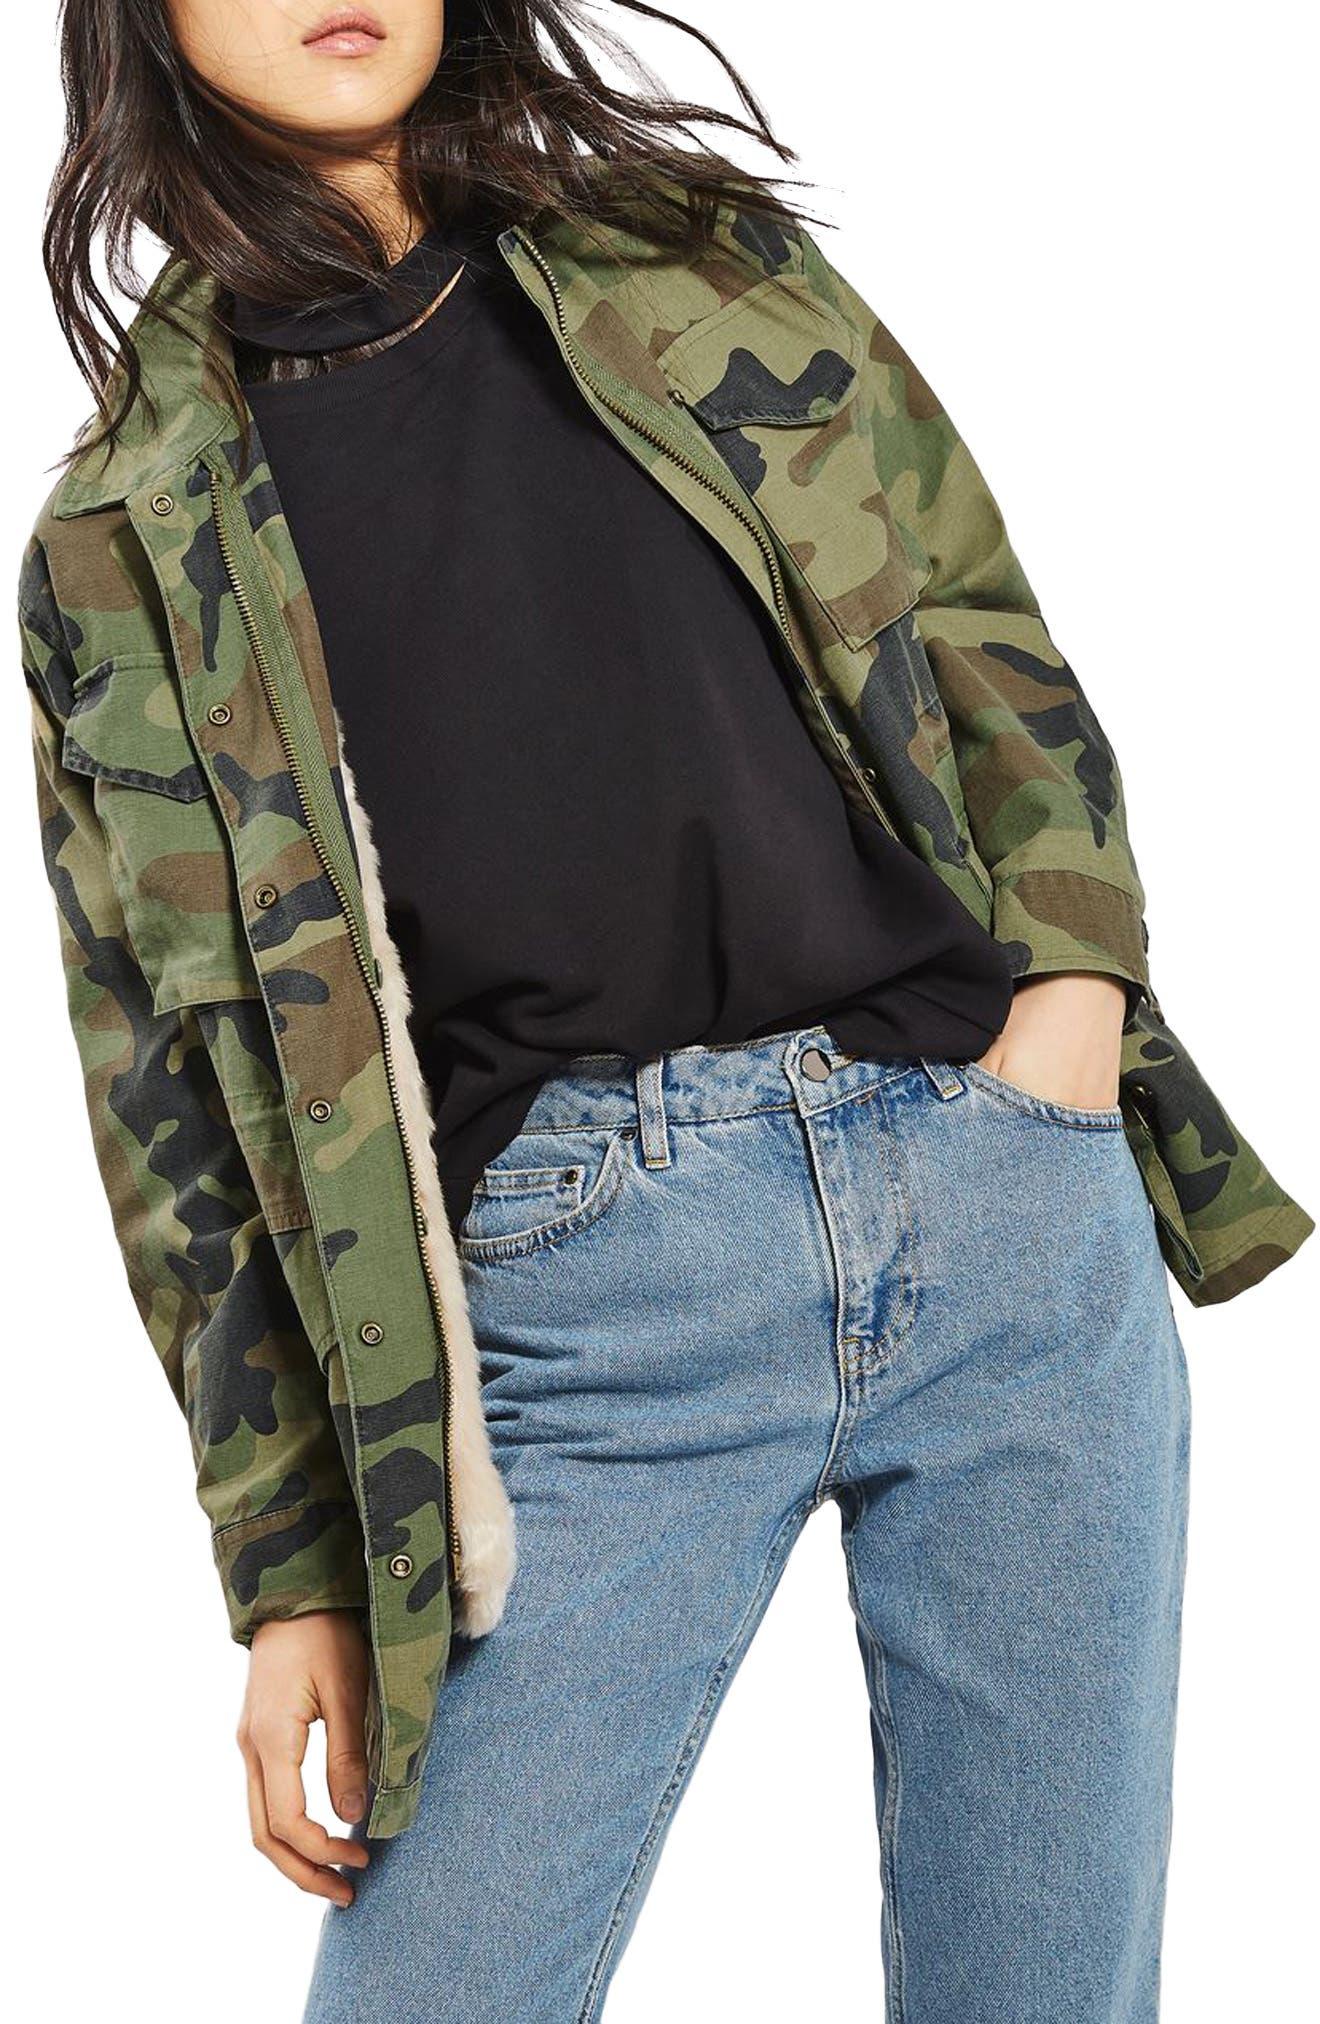 Alternate Image 1 Selected - Topshop Ben Faux Fur Lined Camo Jacket